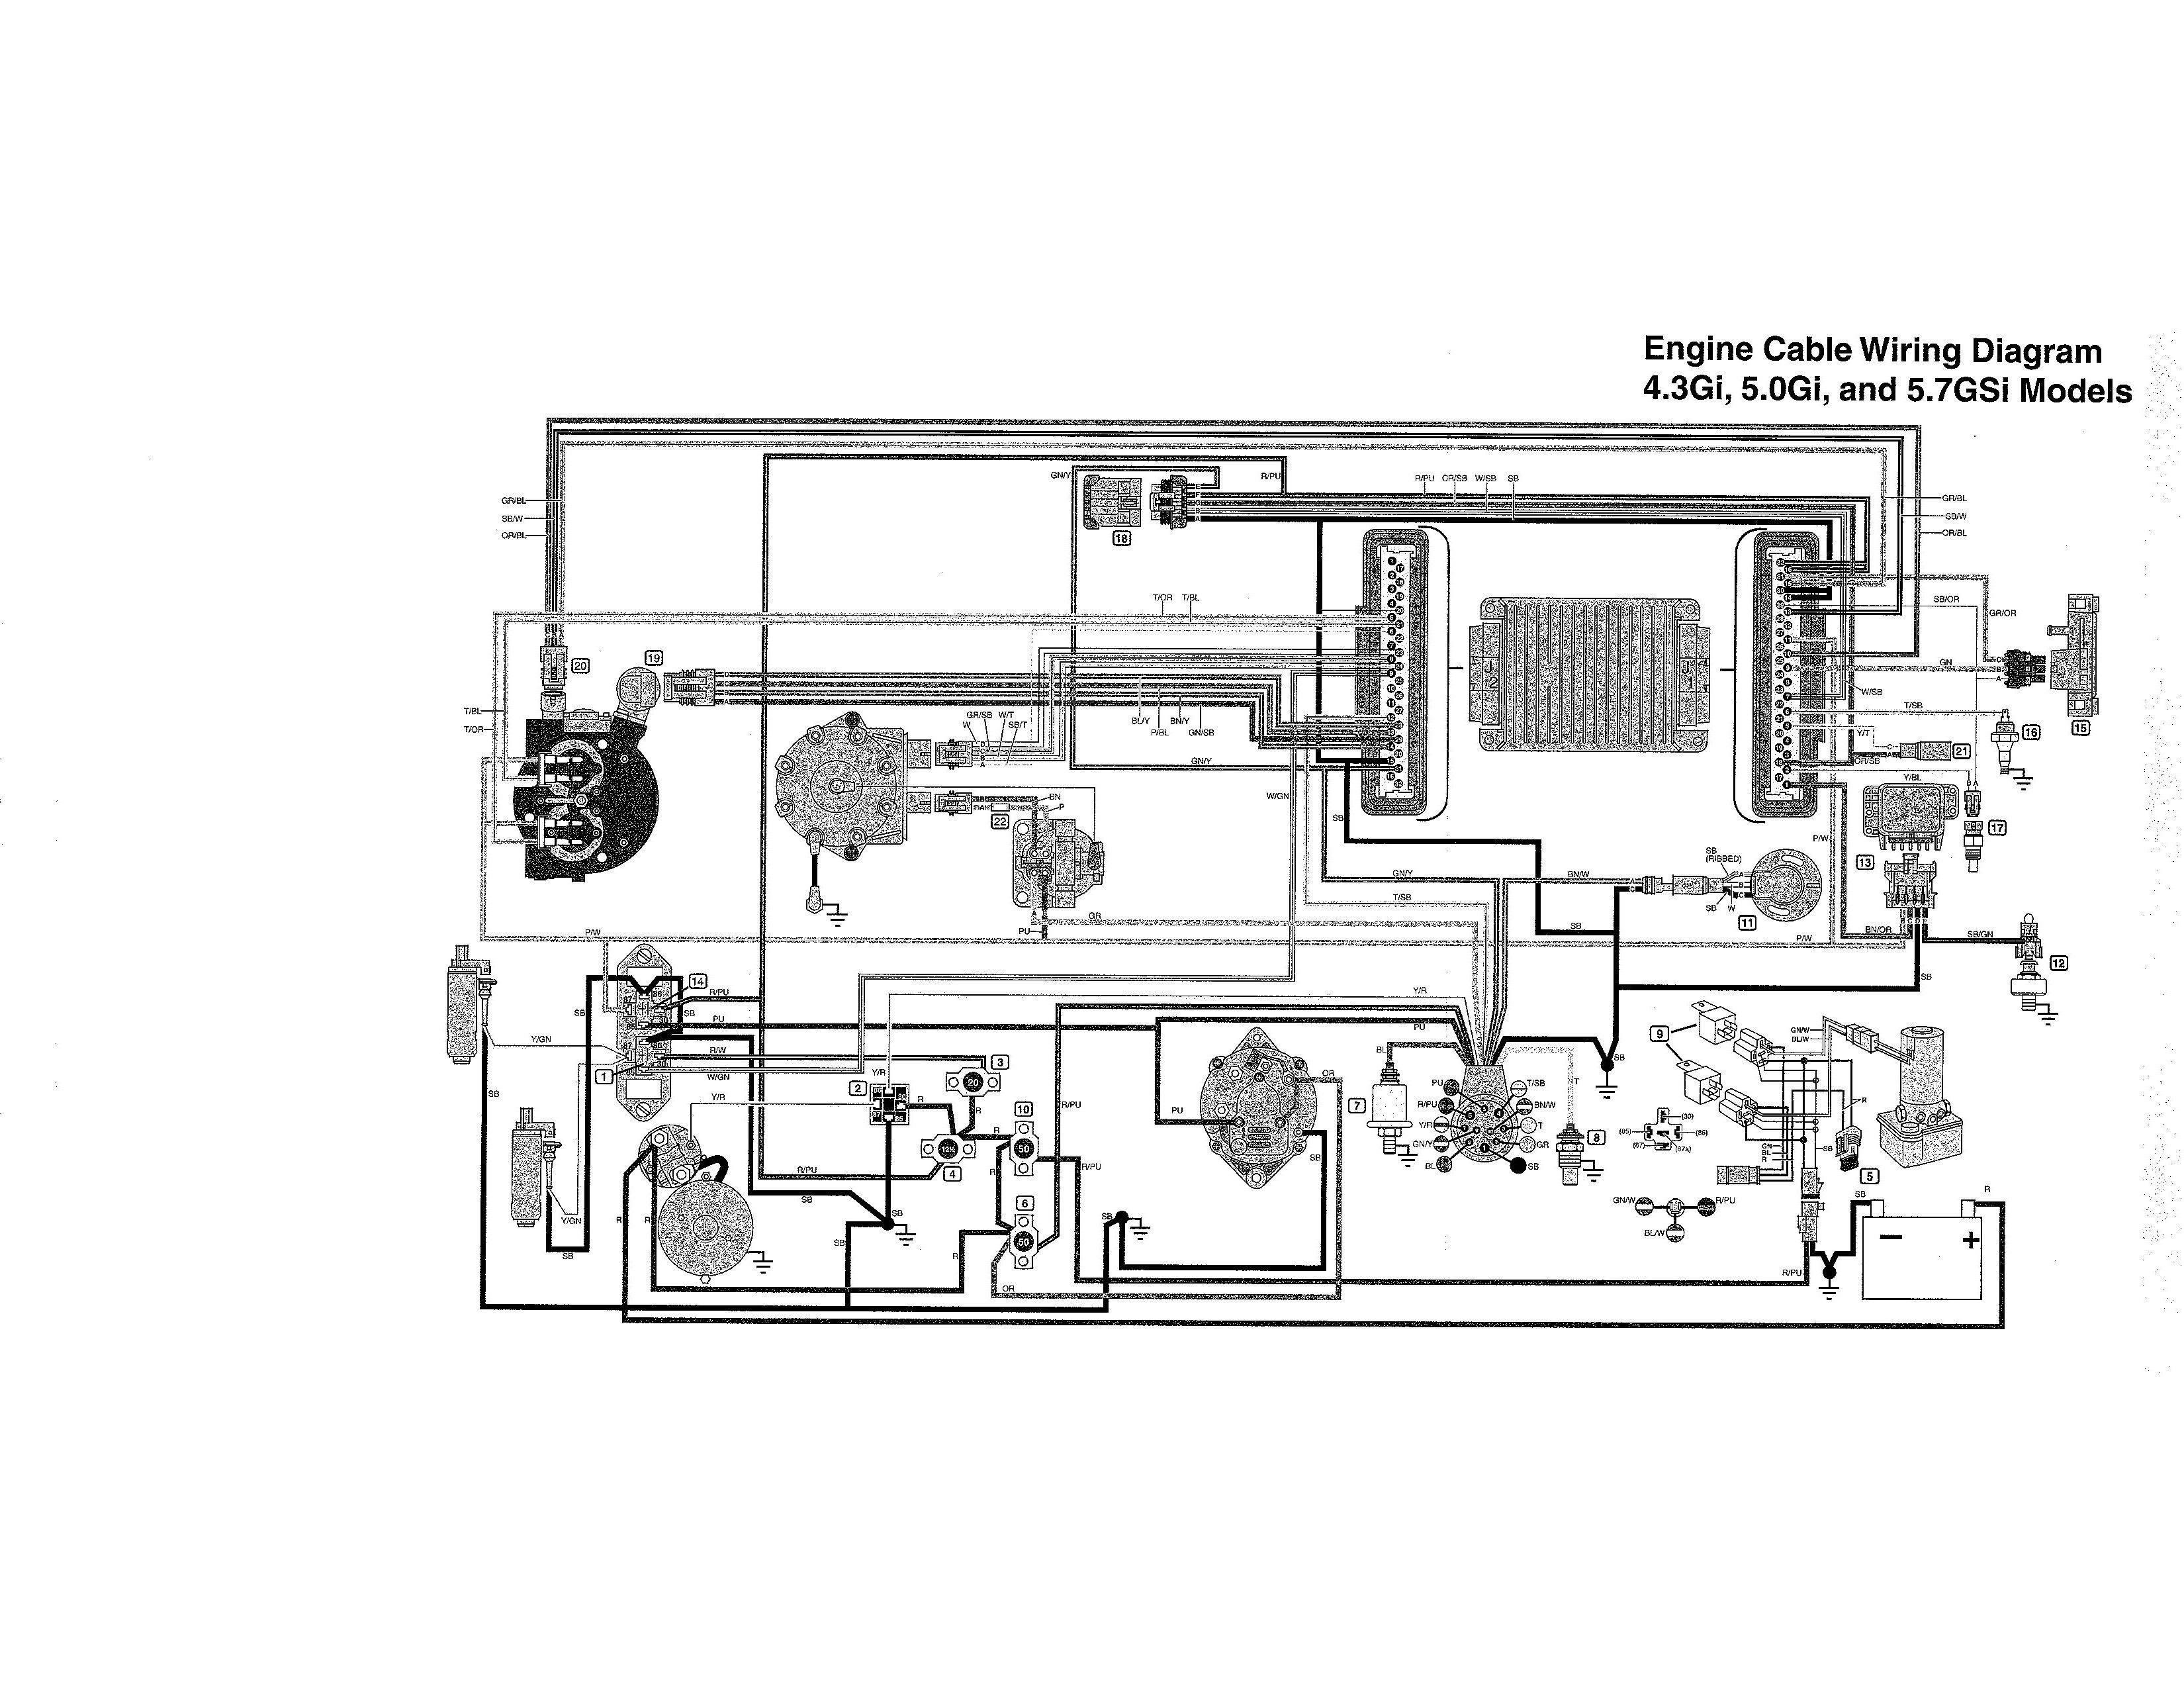 Volvo Penta 5 0 Gi Wiring Diagram - 1999 Saturn Sl1 Fuse Box -  gsxr750.nescafe.jeanjaures37.frWiring Diagram Resource